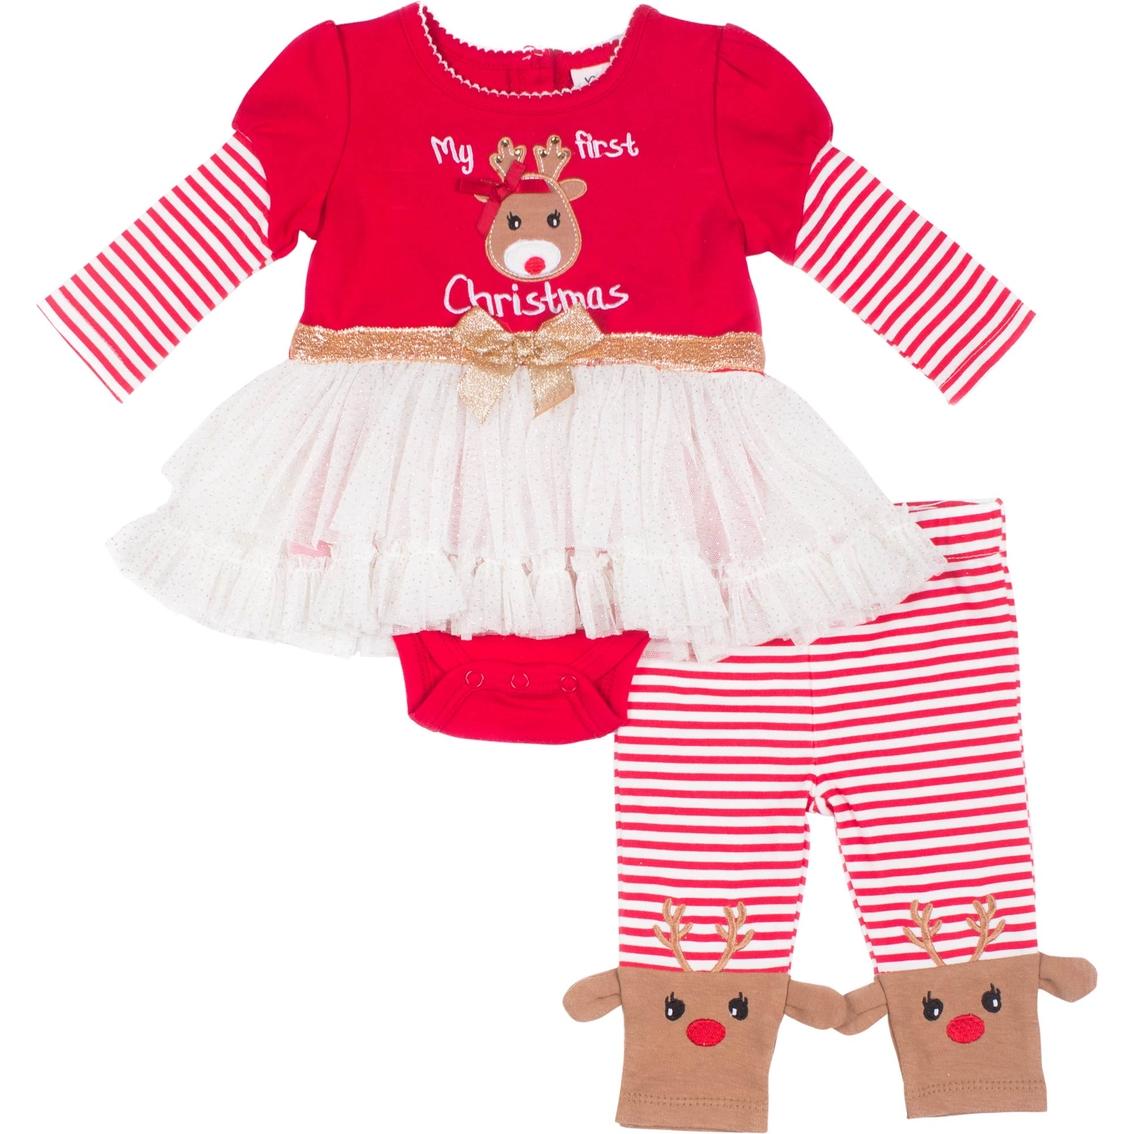 de09f95687330 Little Lass Infant Girls 2 Pc. Reindeer Creeper Set | Baby Girl 0-24 ...